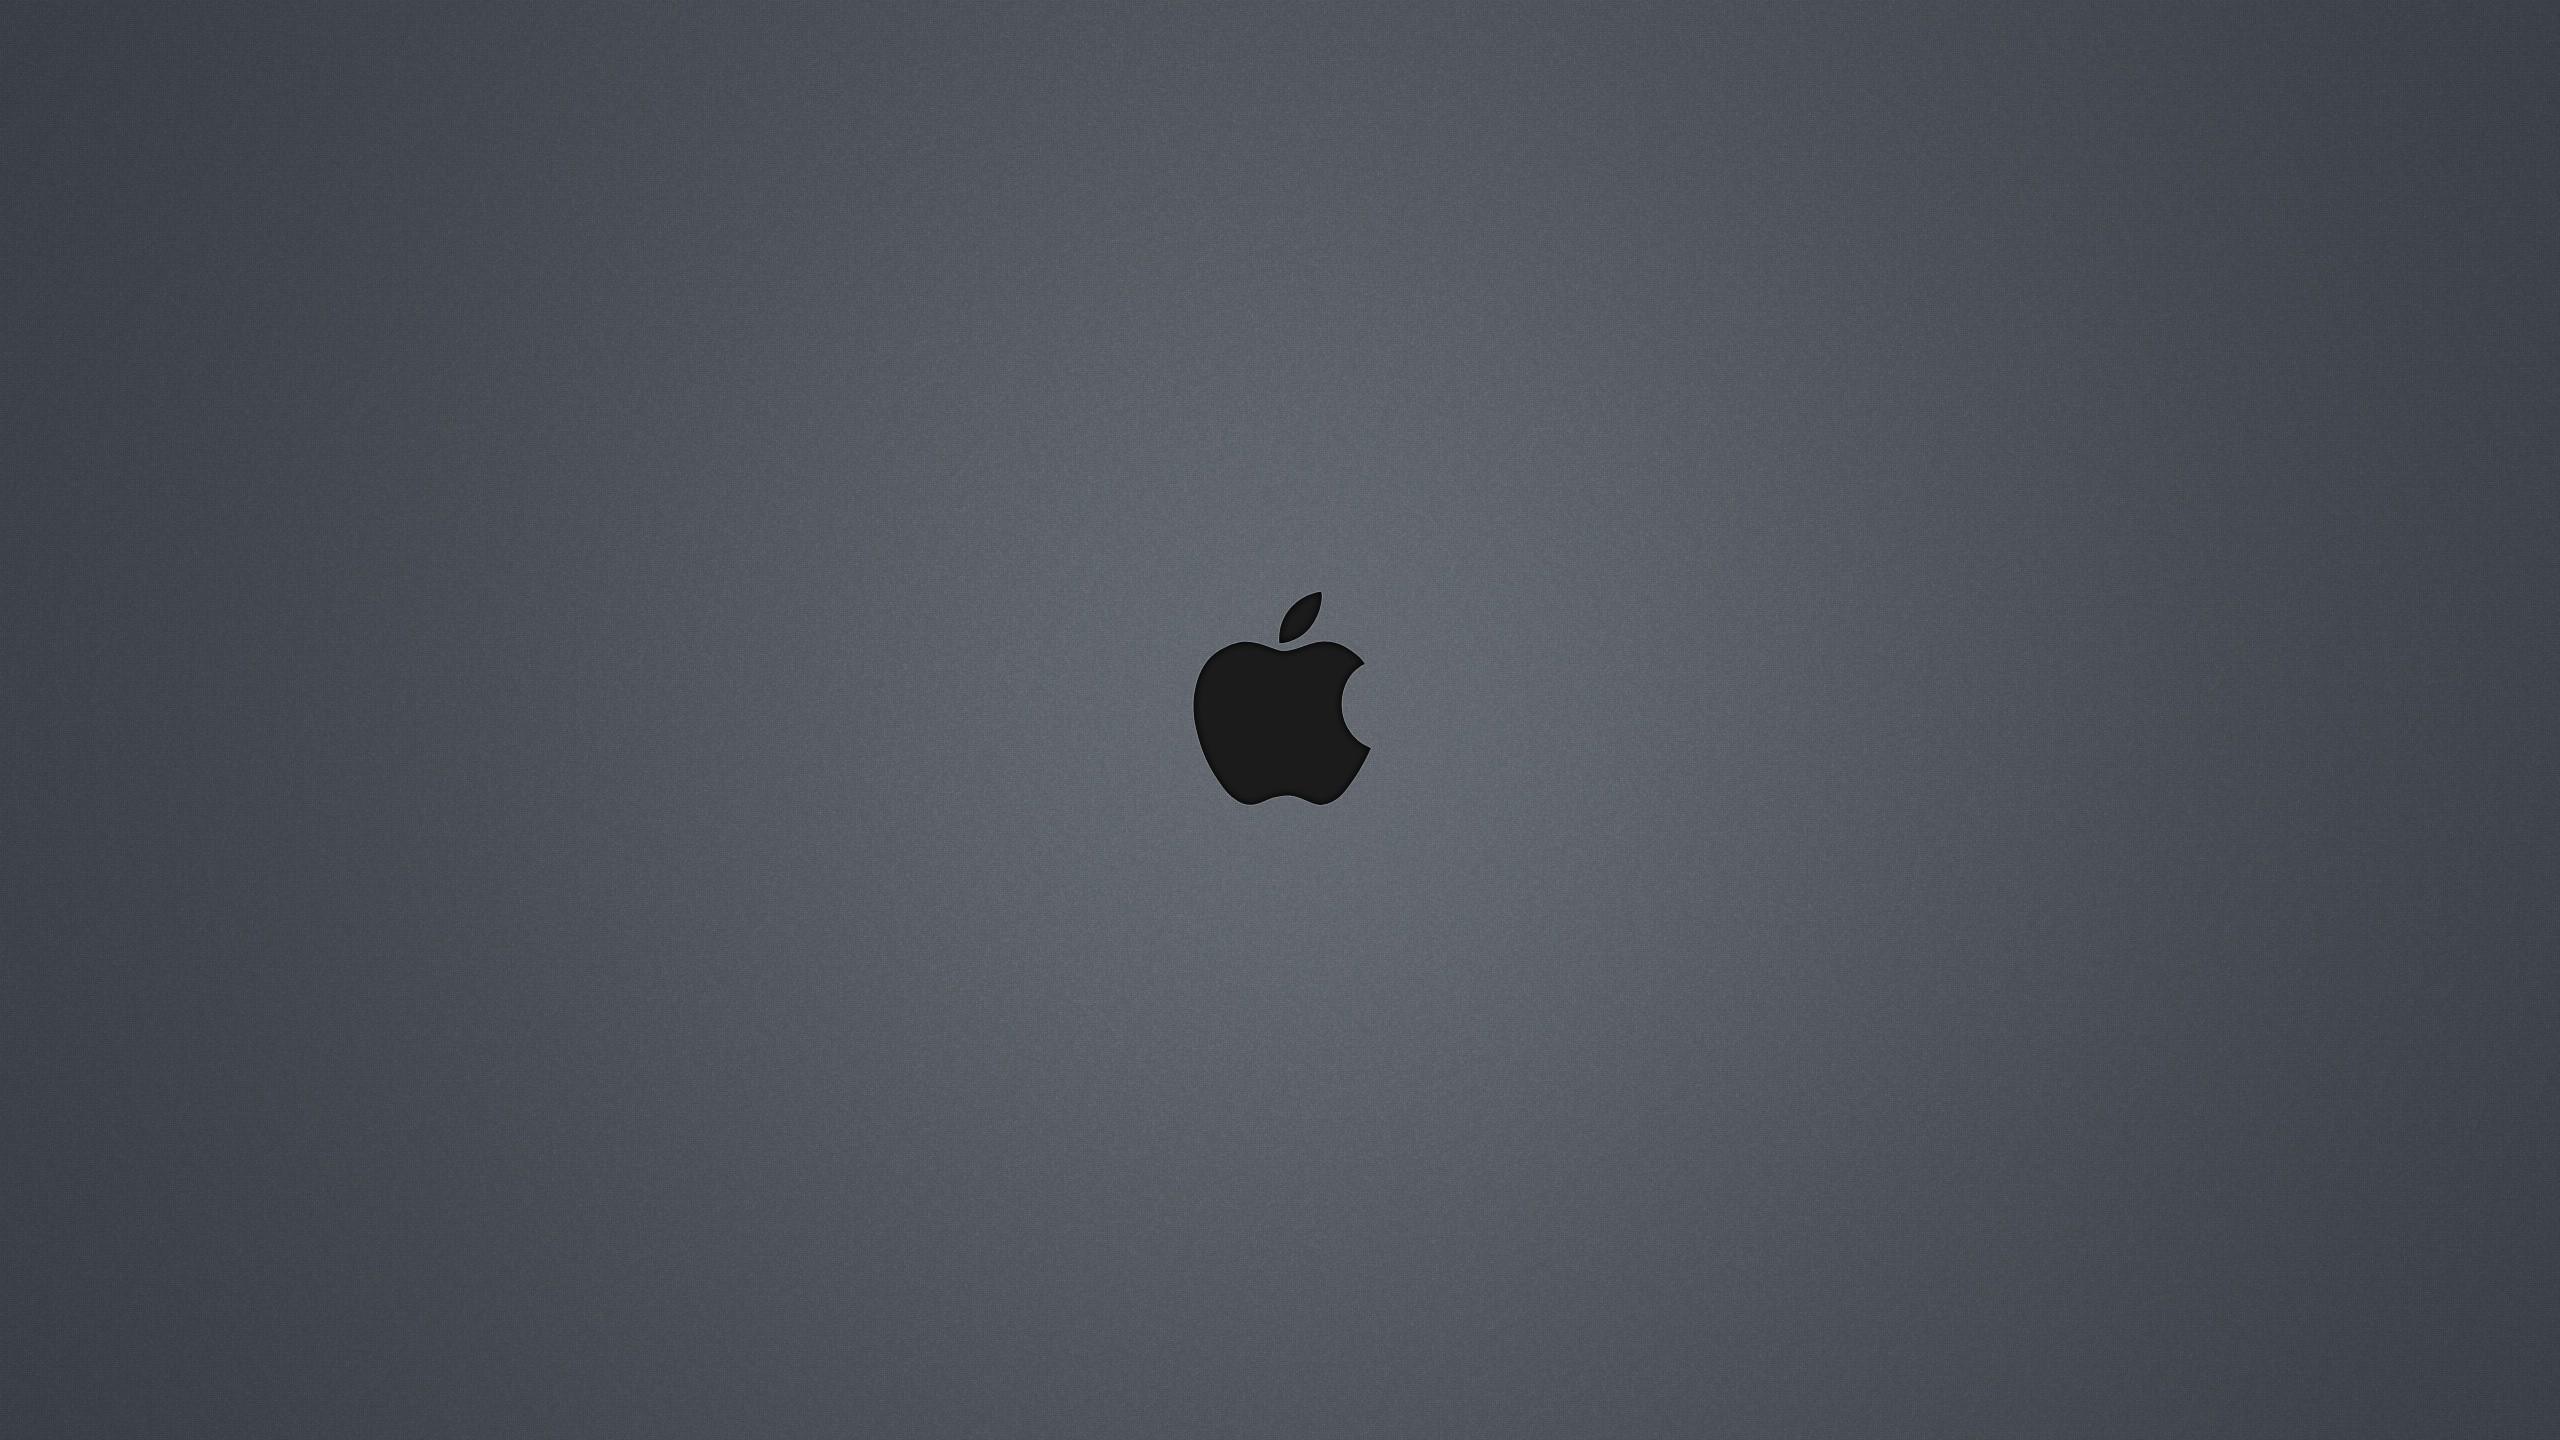 Apple pro desktop PC and Mac wallpaper